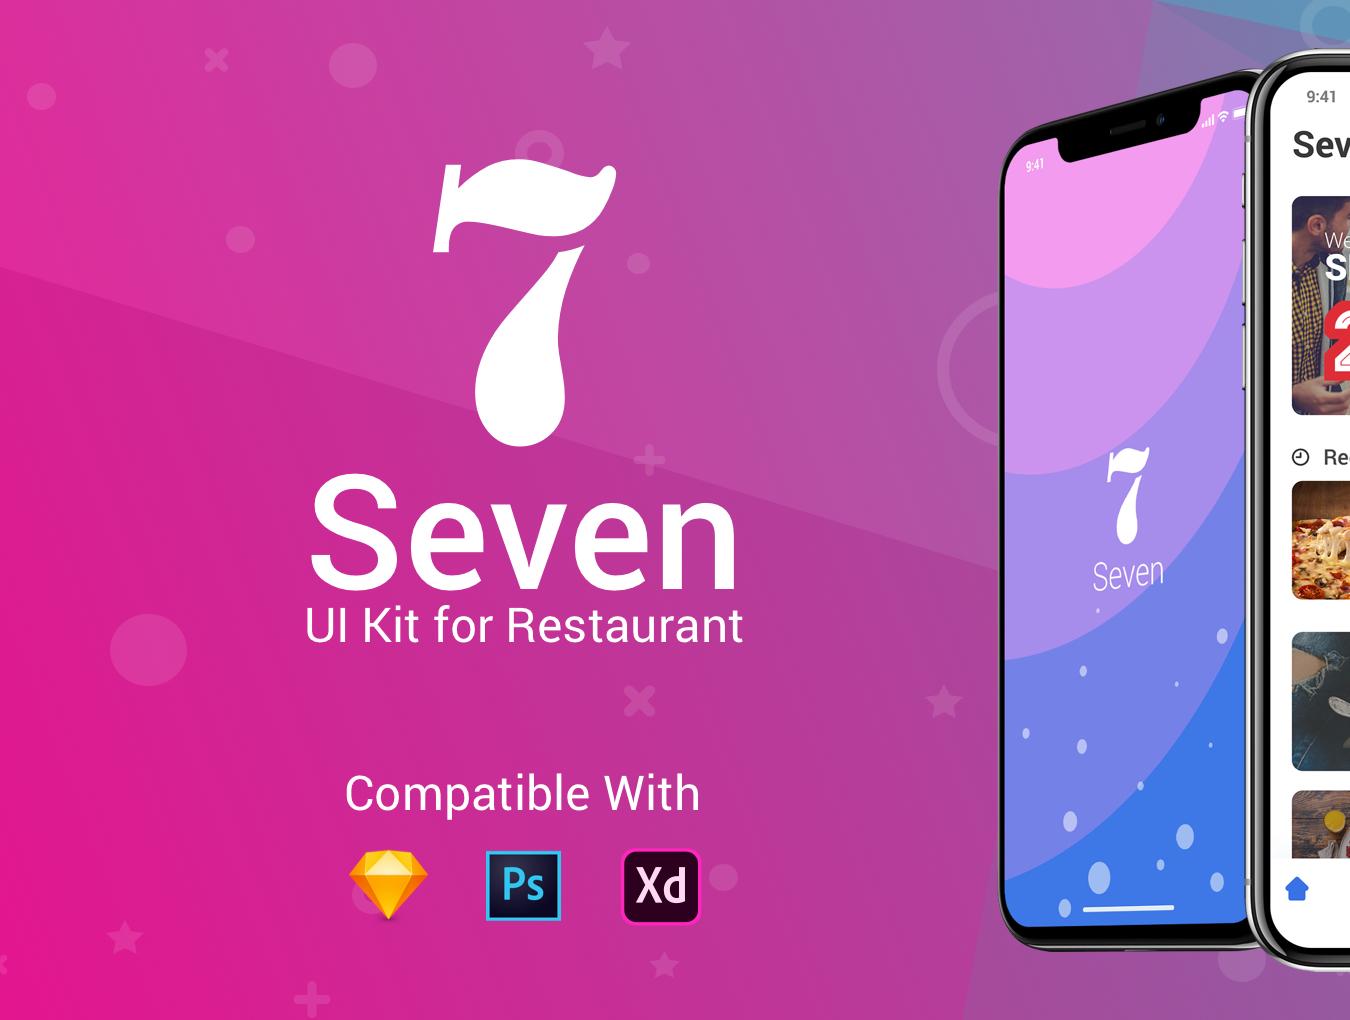 时尚简约IOS11风格饮食行业APP Seven Restaurant UI Kit